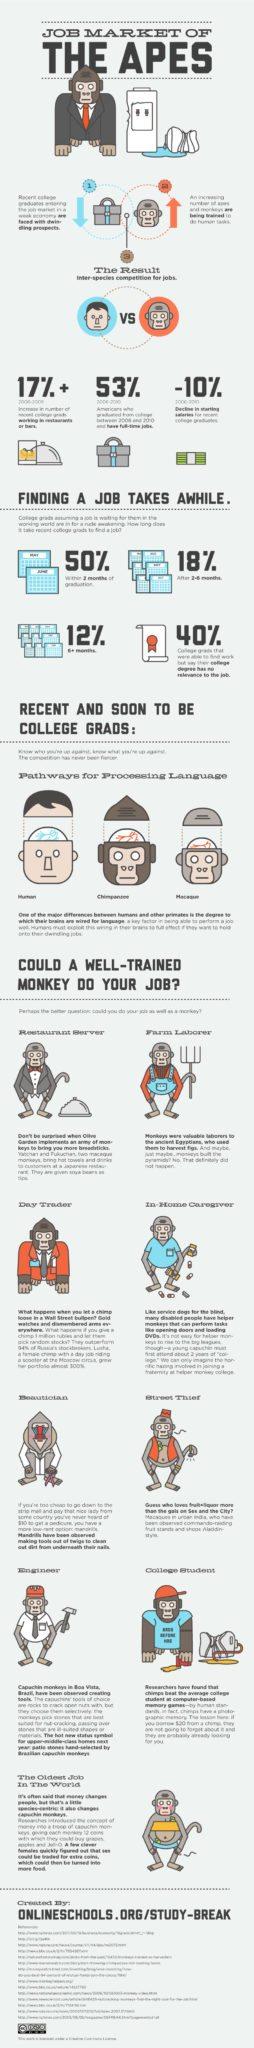 Job Market of The Apes